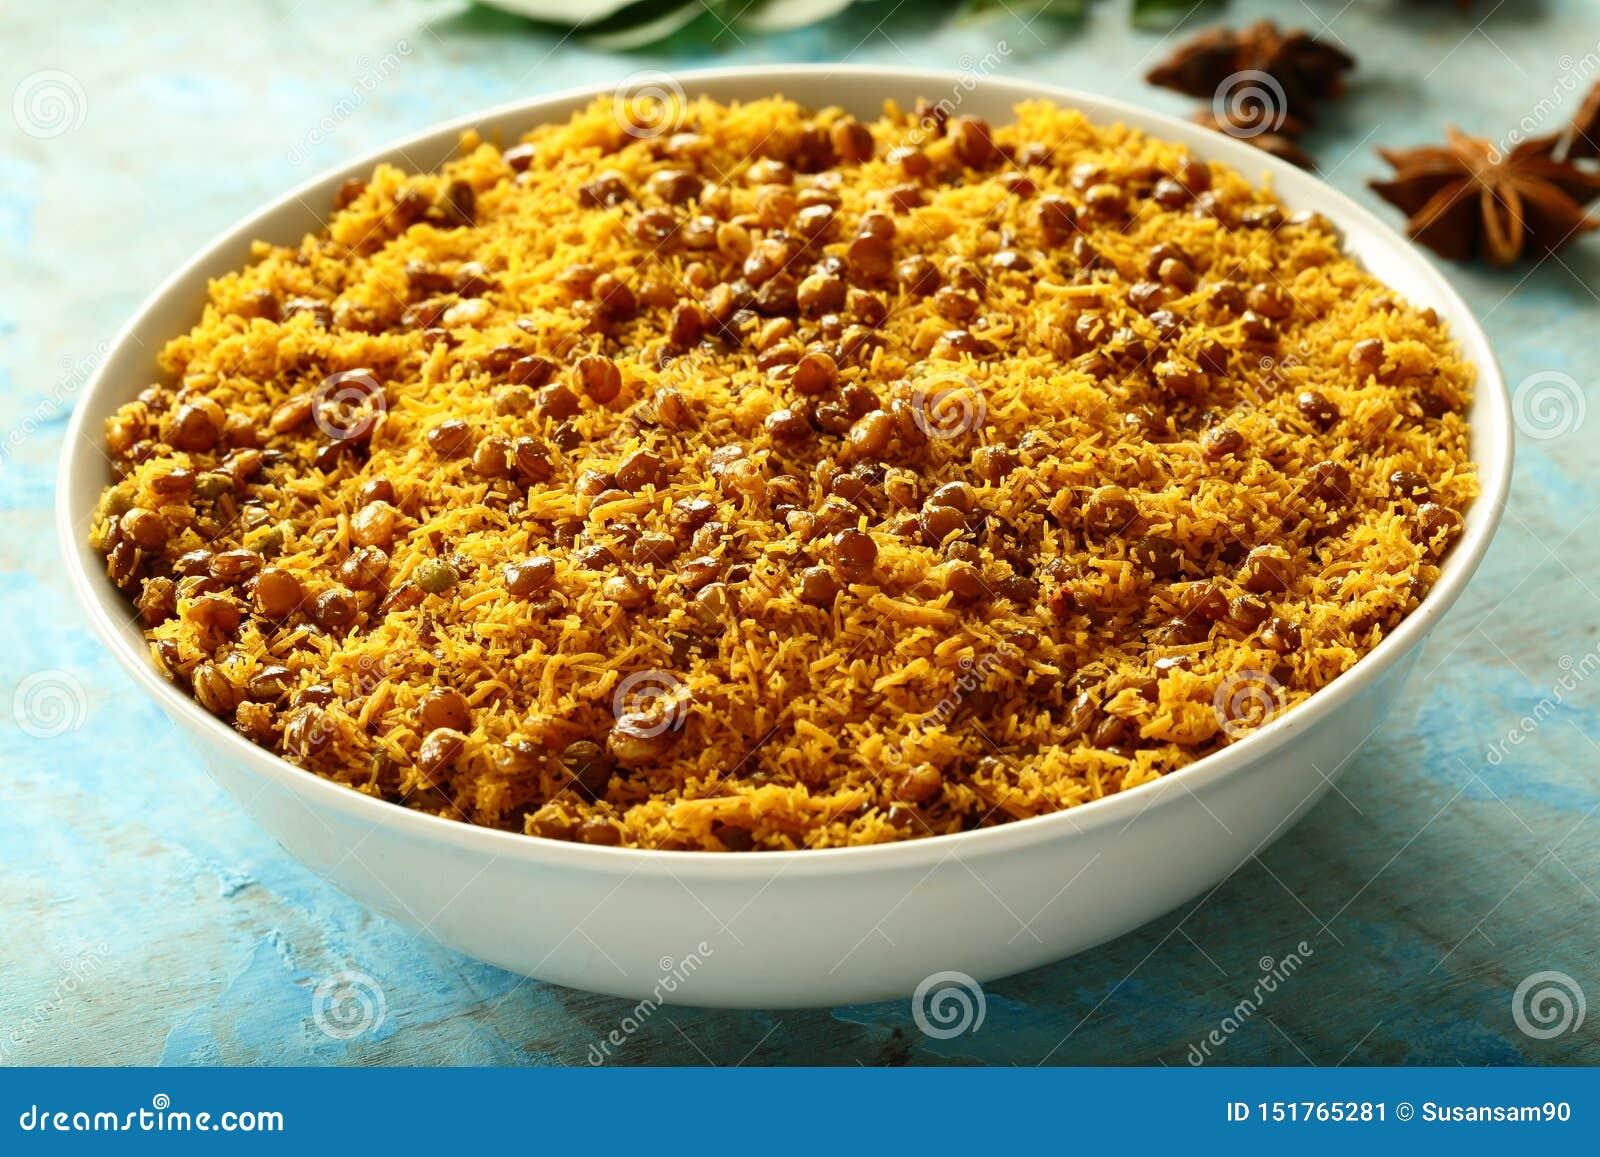 Bowl of Dal biji,moth namkeen Indian fried spicy snacks